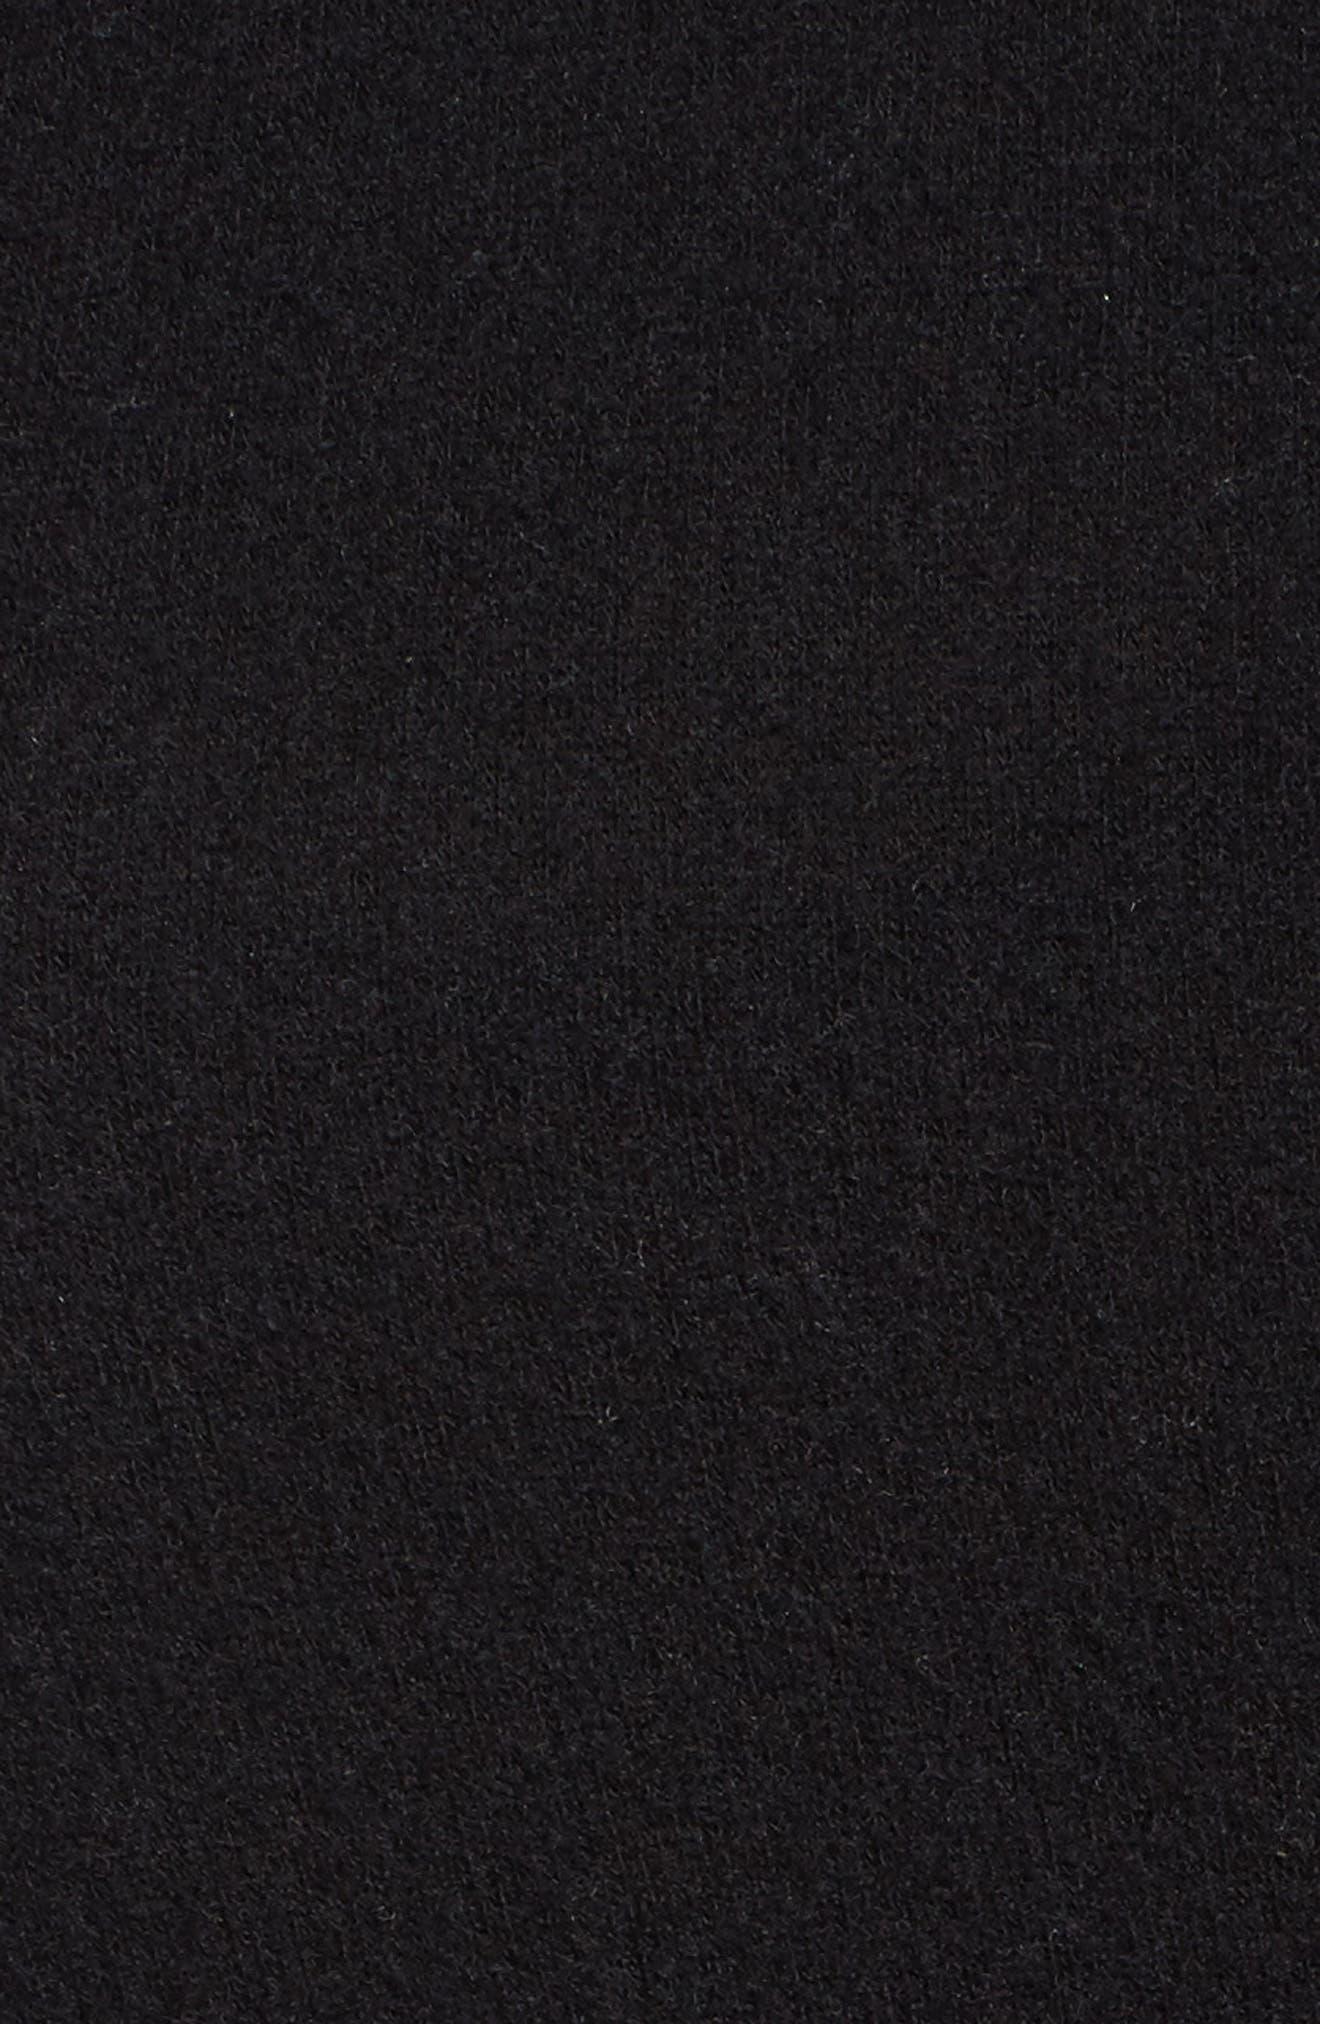 Drop Shoulder Pocket Top,                             Alternate thumbnail 5, color,                             Black